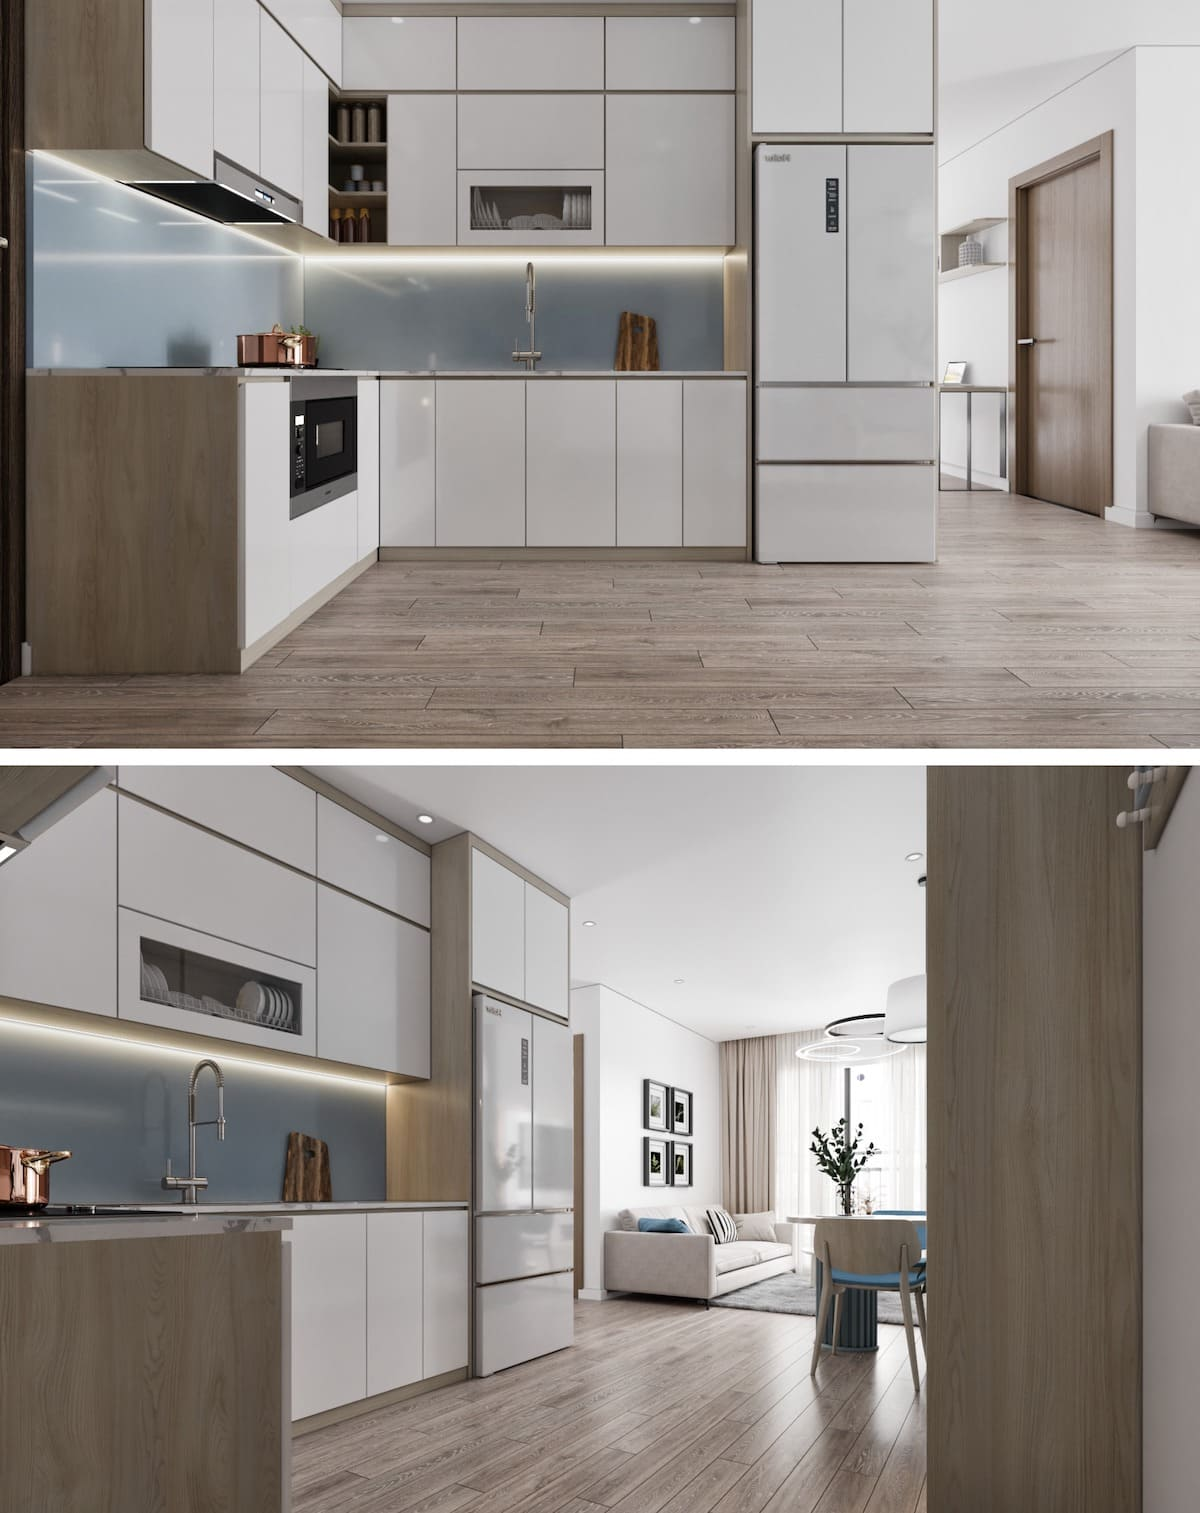 дизайн интерьера модной квартиры фото 82